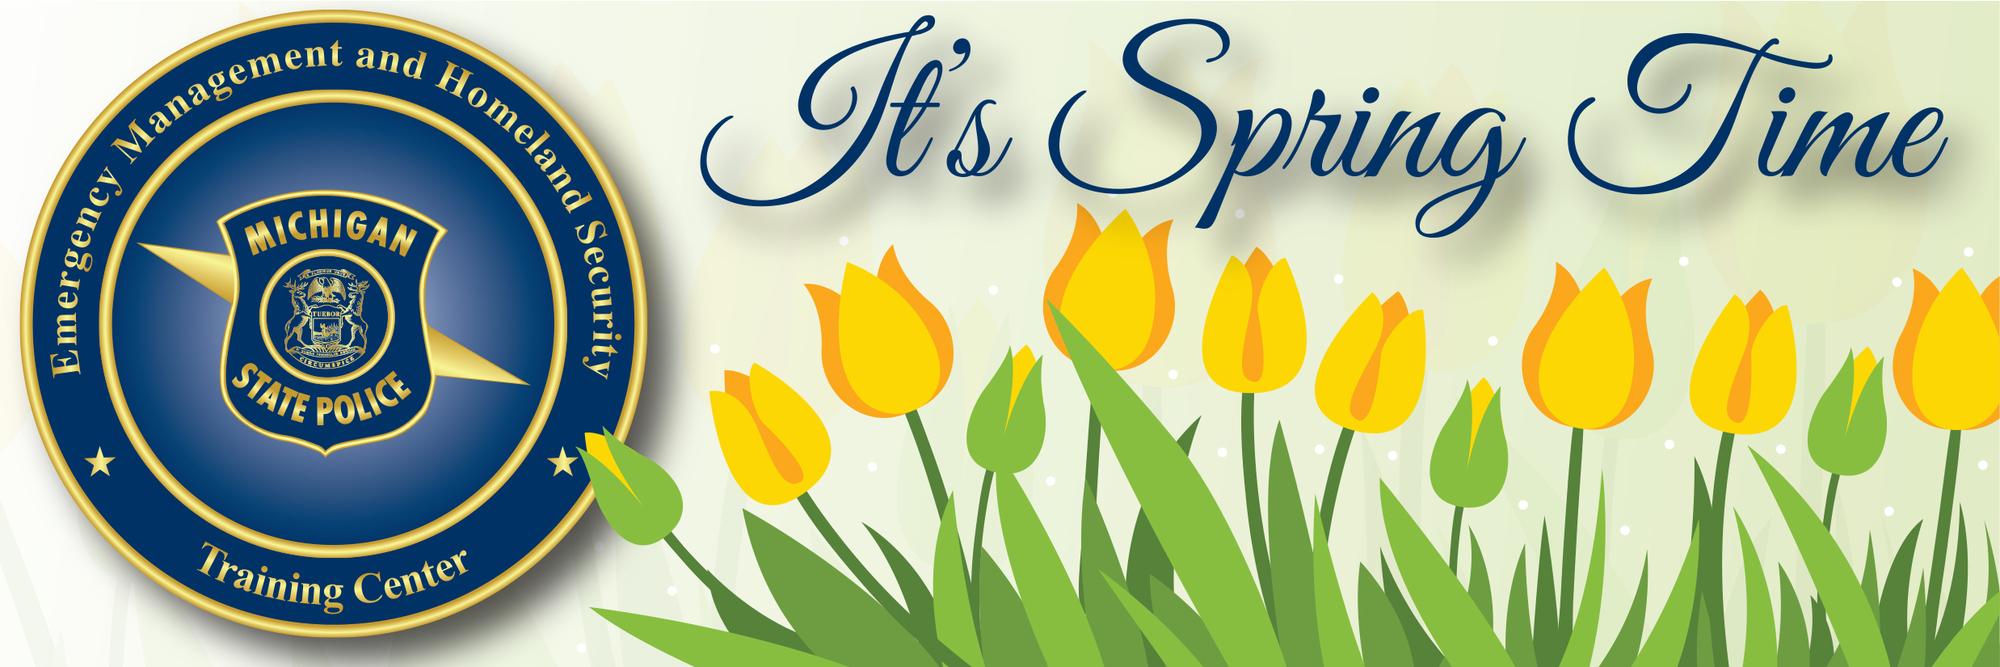 EMHSTC Spring